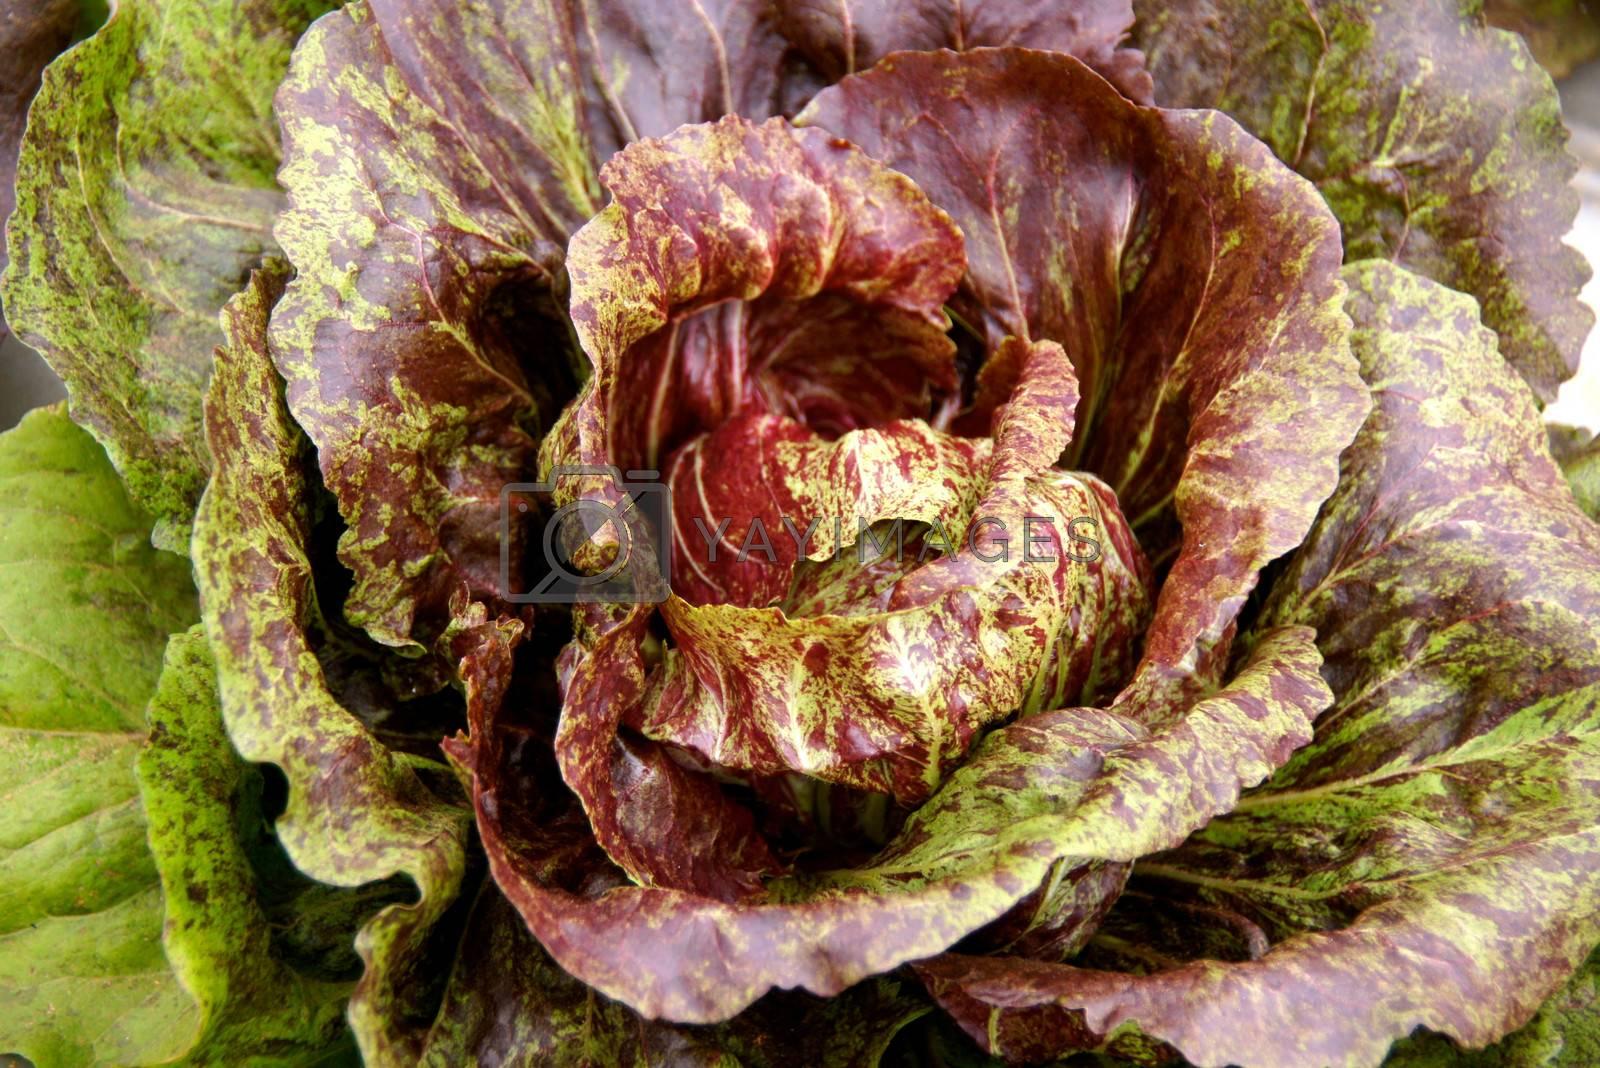 Royalty free image of vivid vegetable 3 by nattapatt